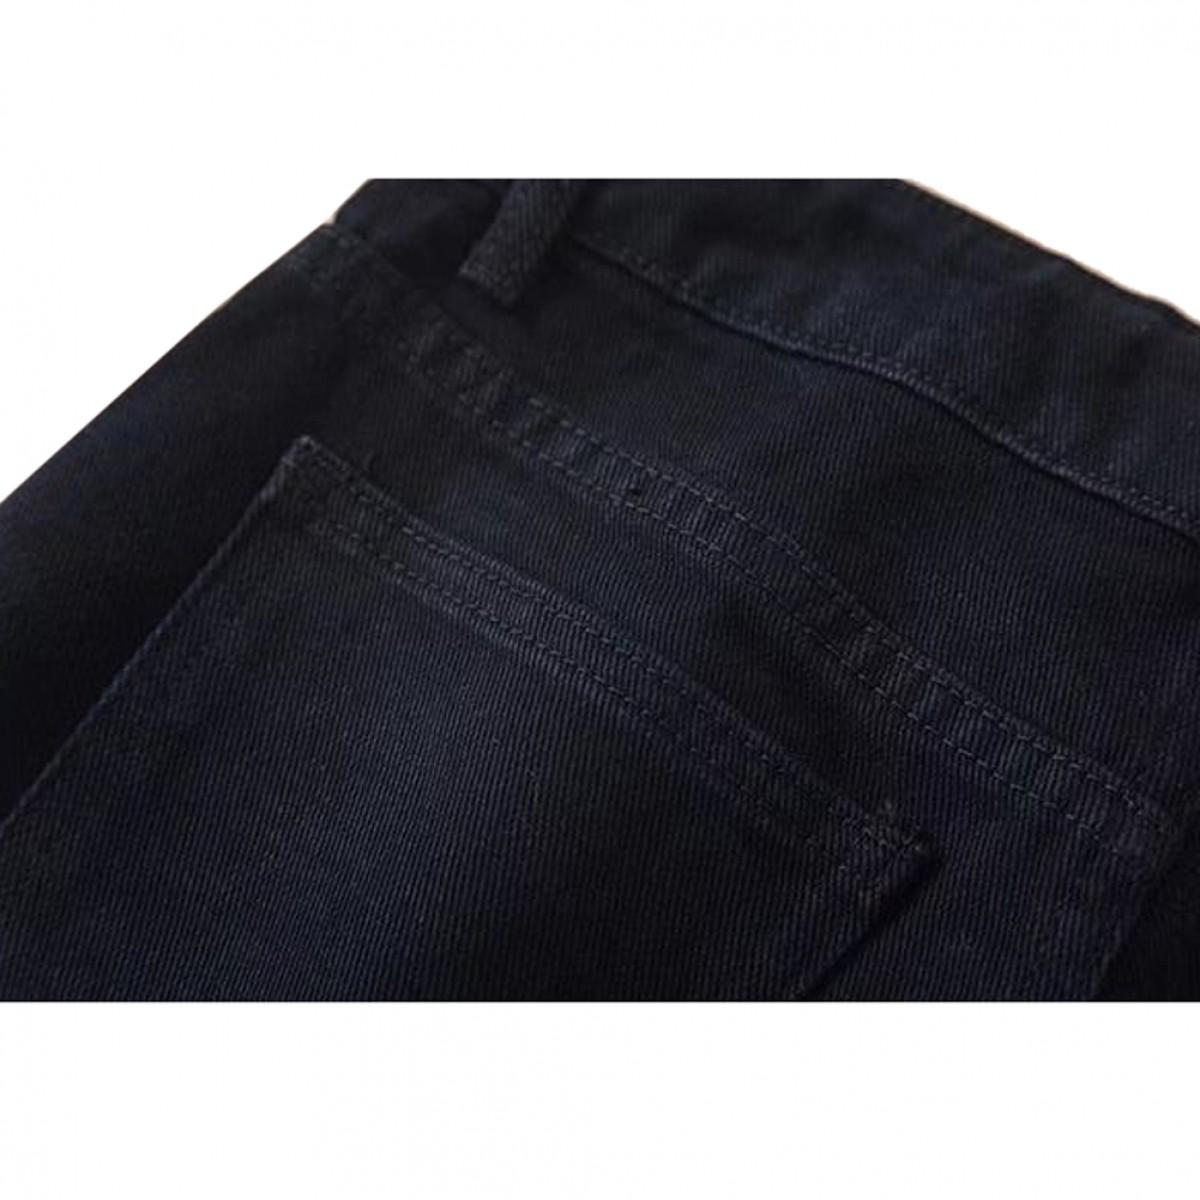 Womens Distressed Black Denim Shorts   LATICCI